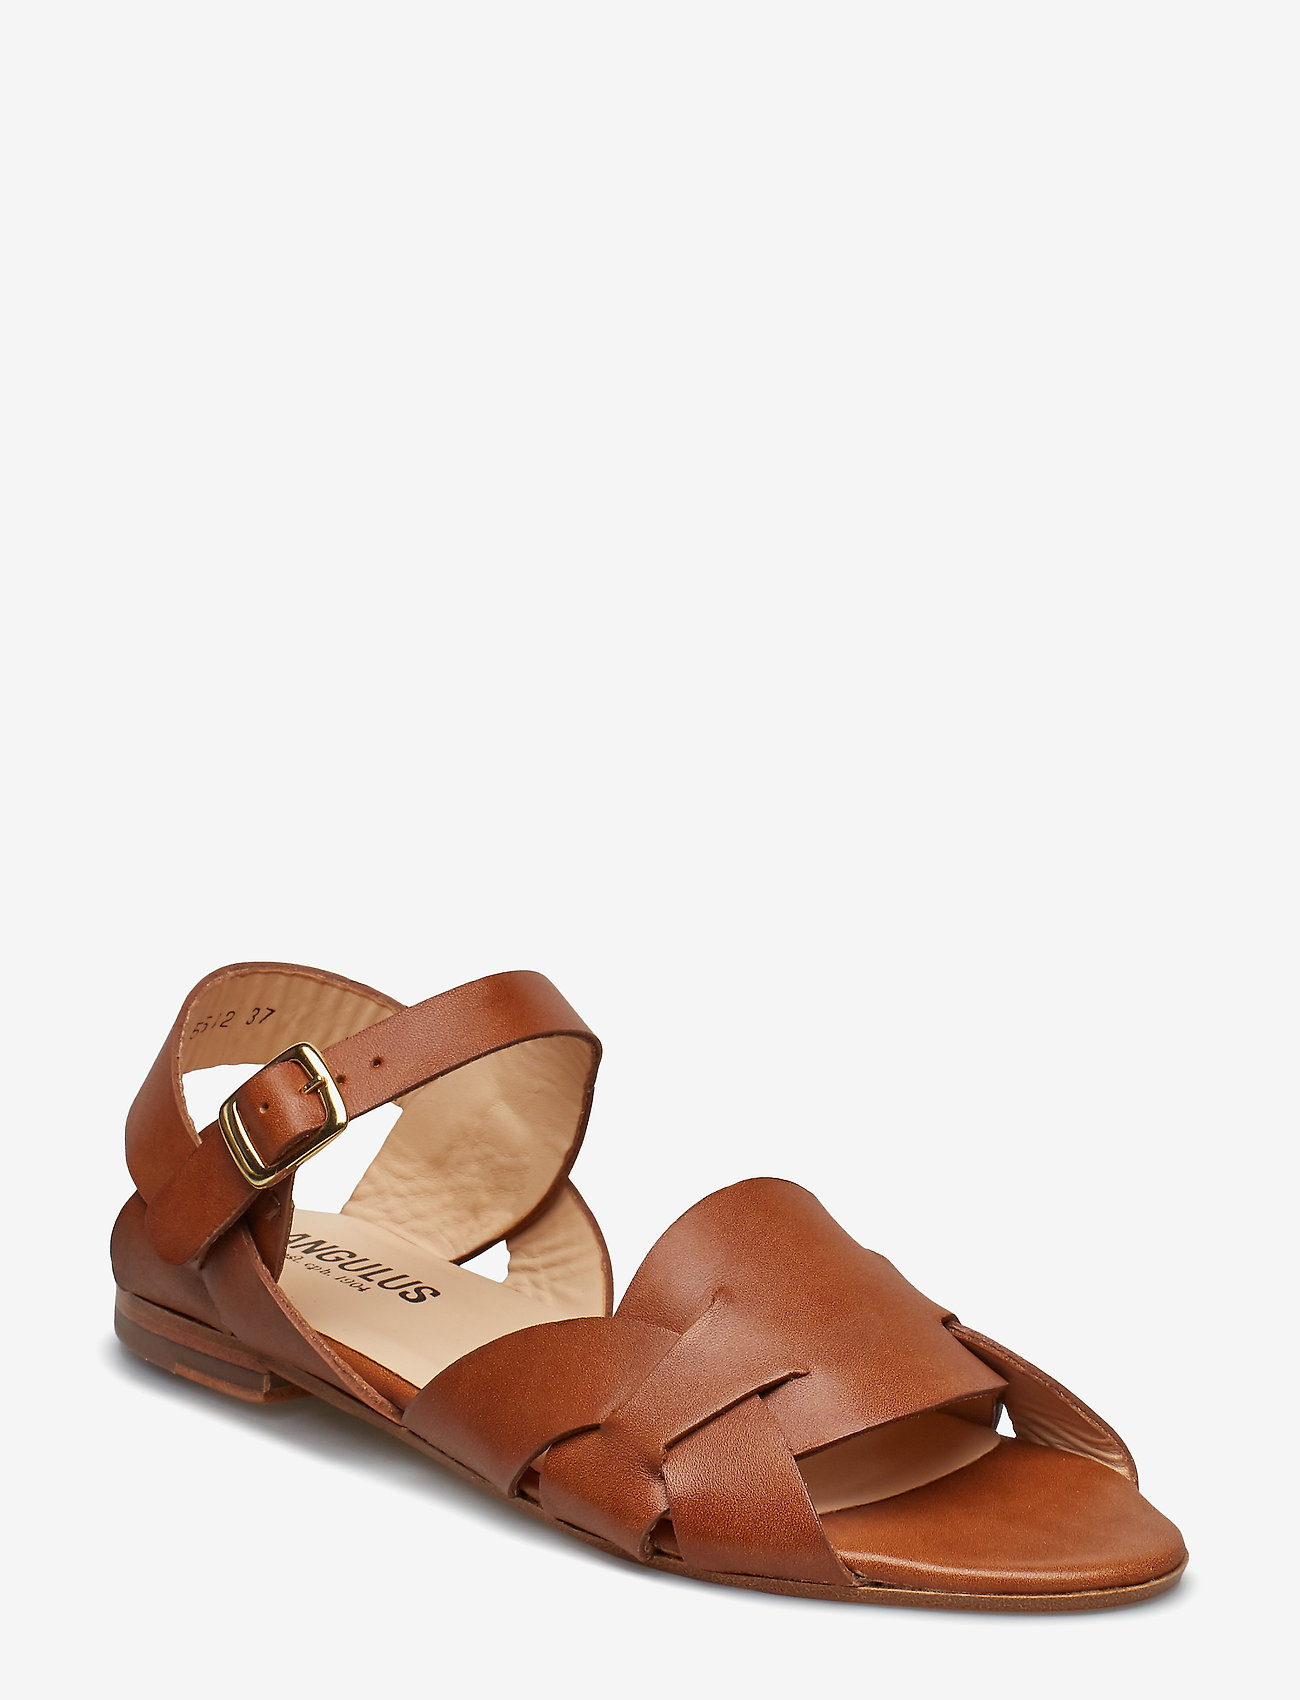 ANGULUS - Sandals - flat - flade sandaler - 1789 tan - 0